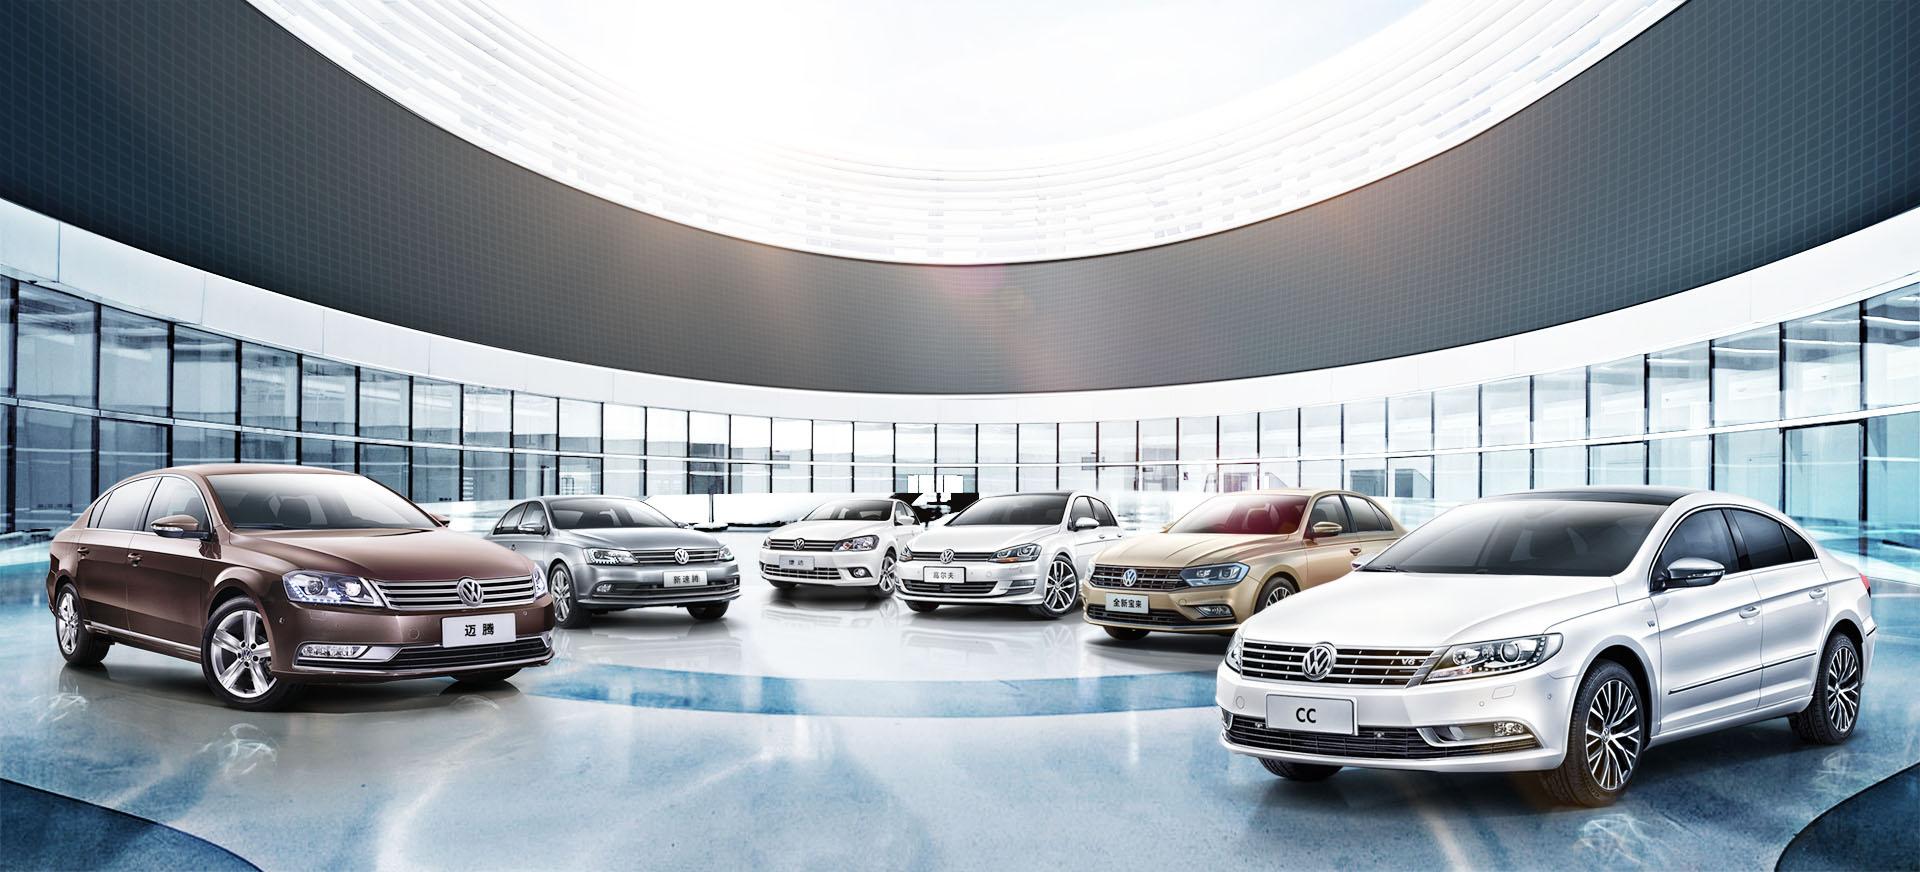 volkswagen showrooms poster  public  car  showroom background image for free download